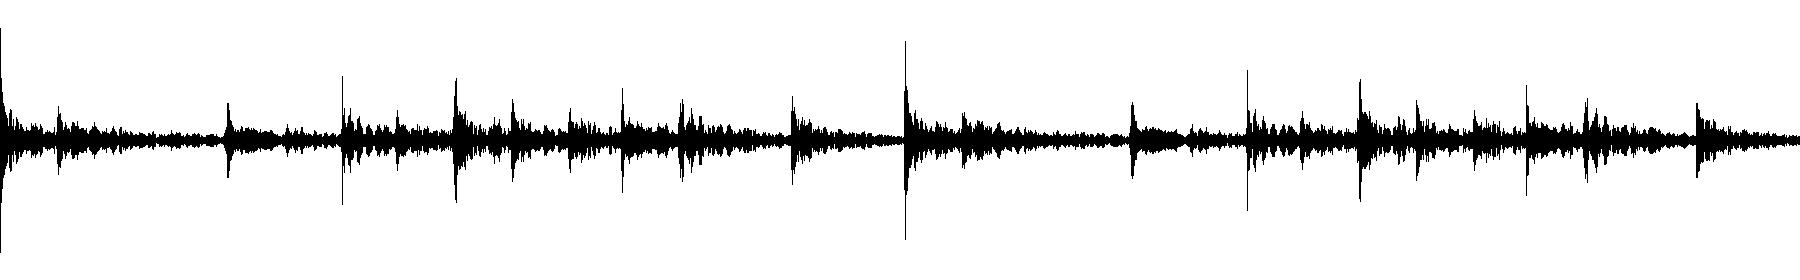 blbc cinedrumsb 75 03